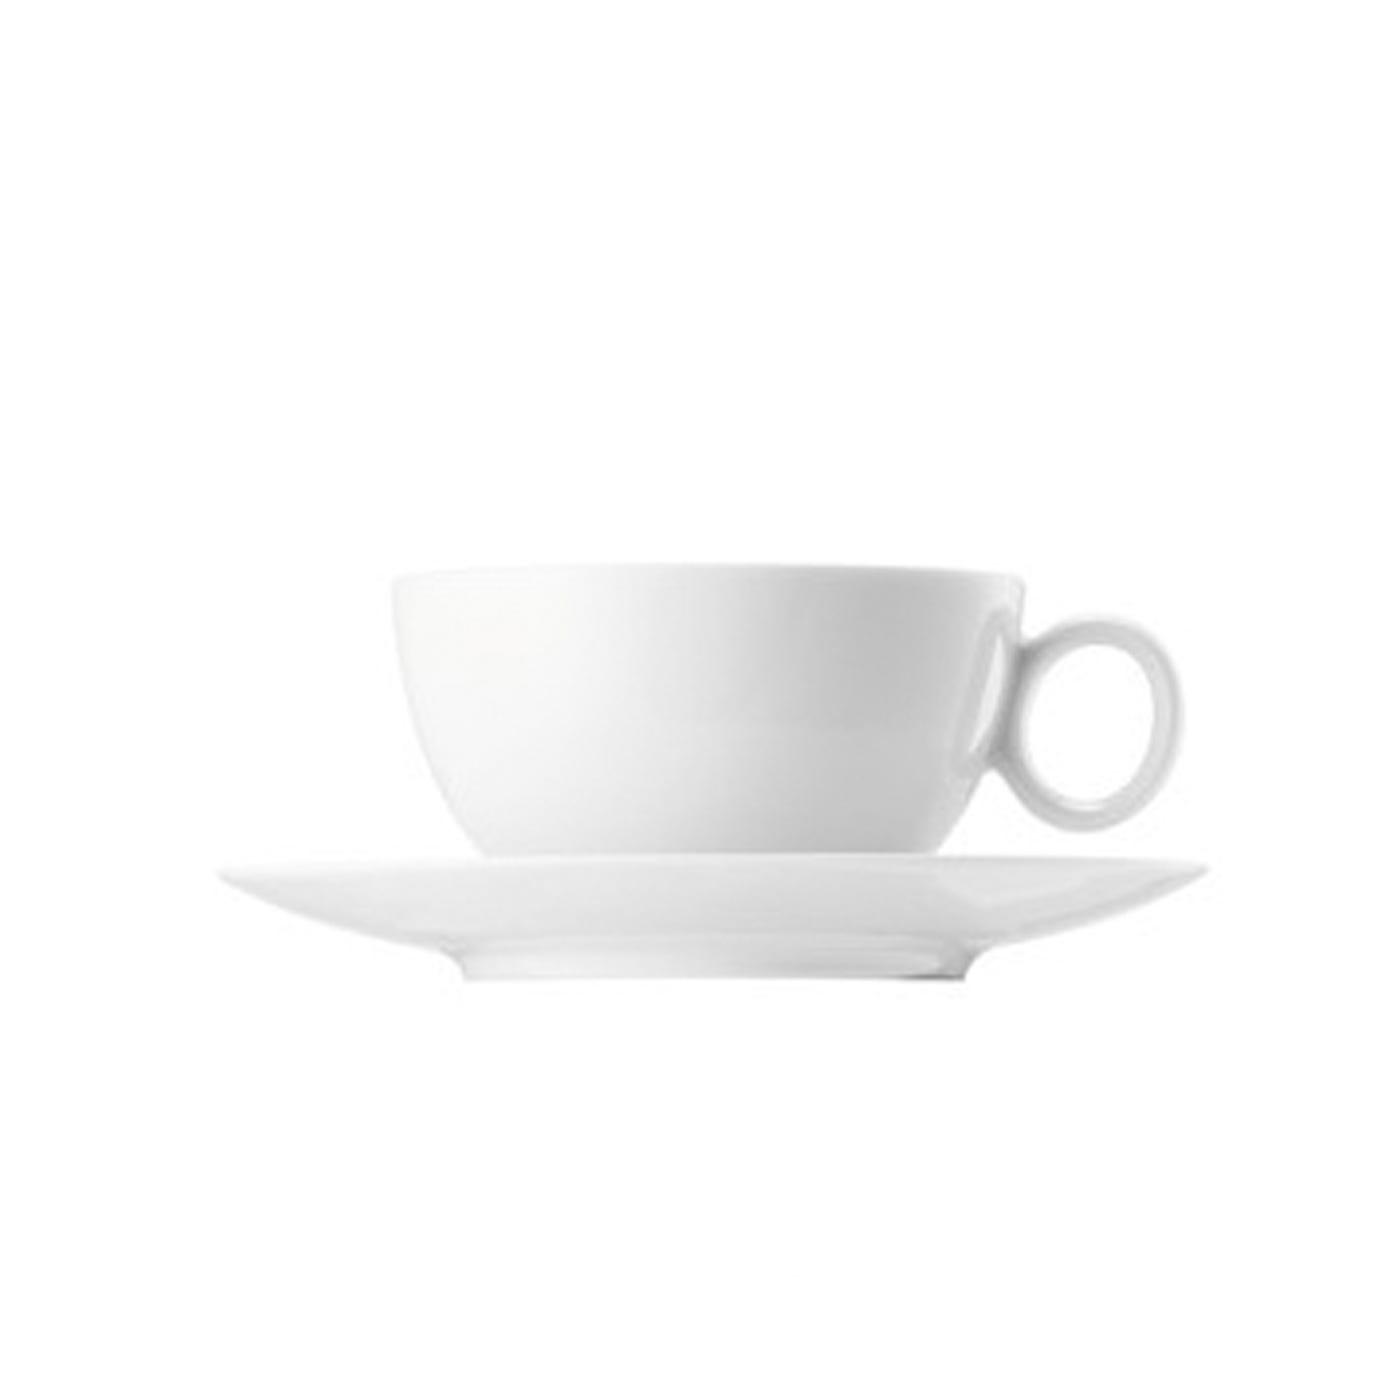 Loft White Breakfast Cup & Saucer